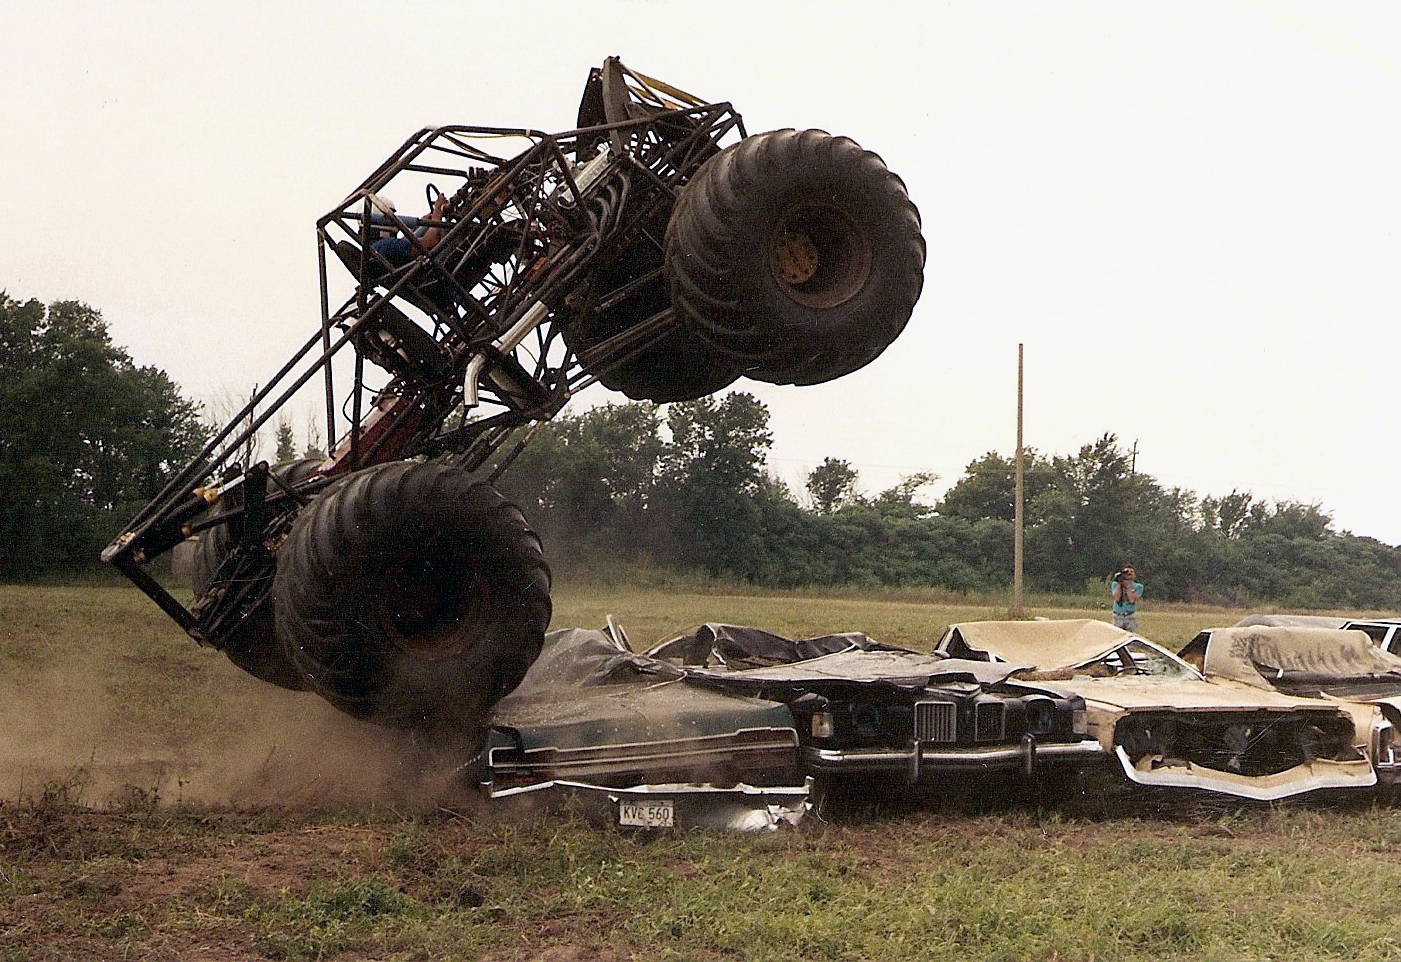 d739c42032e10 Bigfoot vs. USA-1  The Birth of Monster Truck Madness